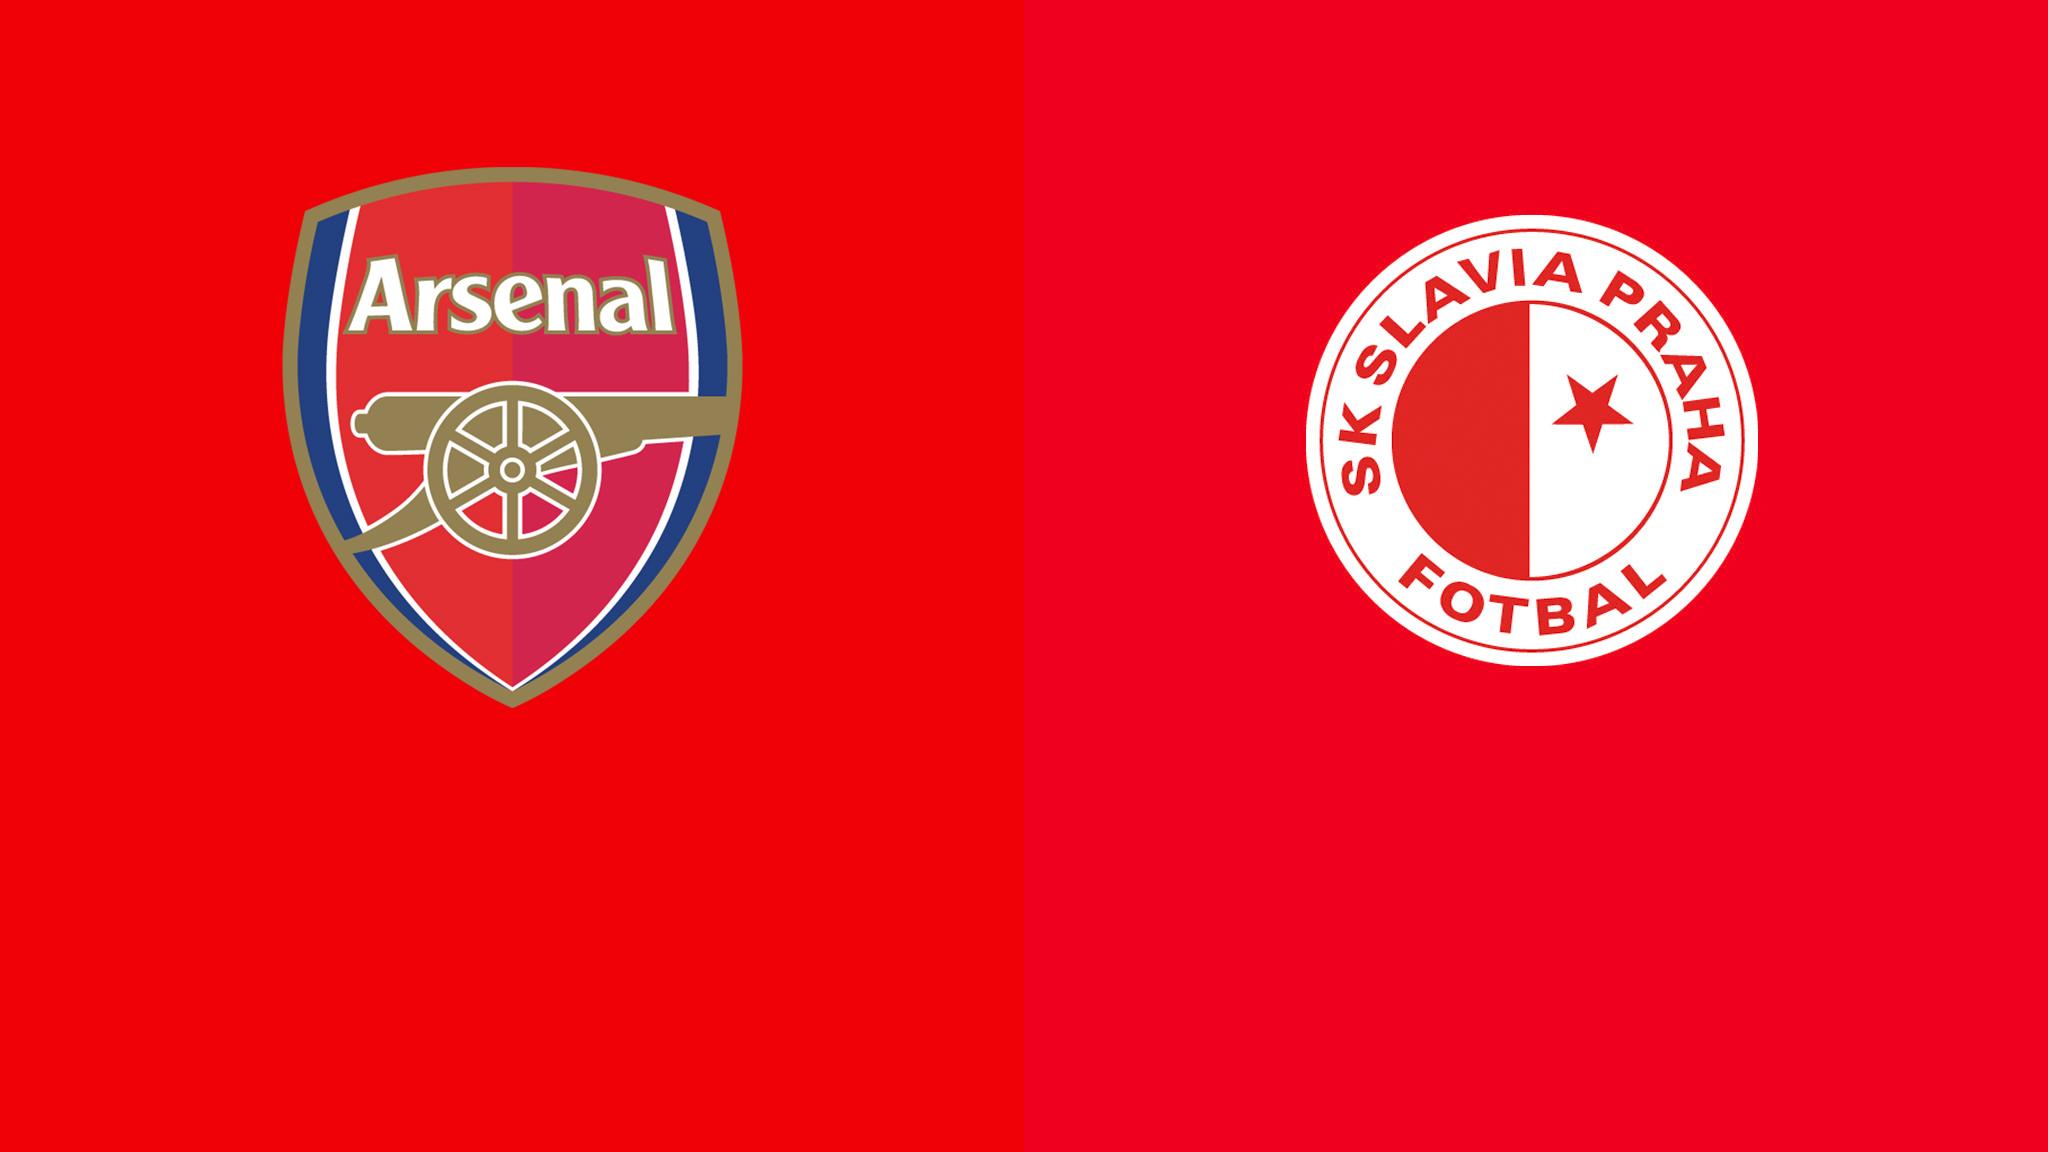 Slavia Prague vs Arsenal second leg